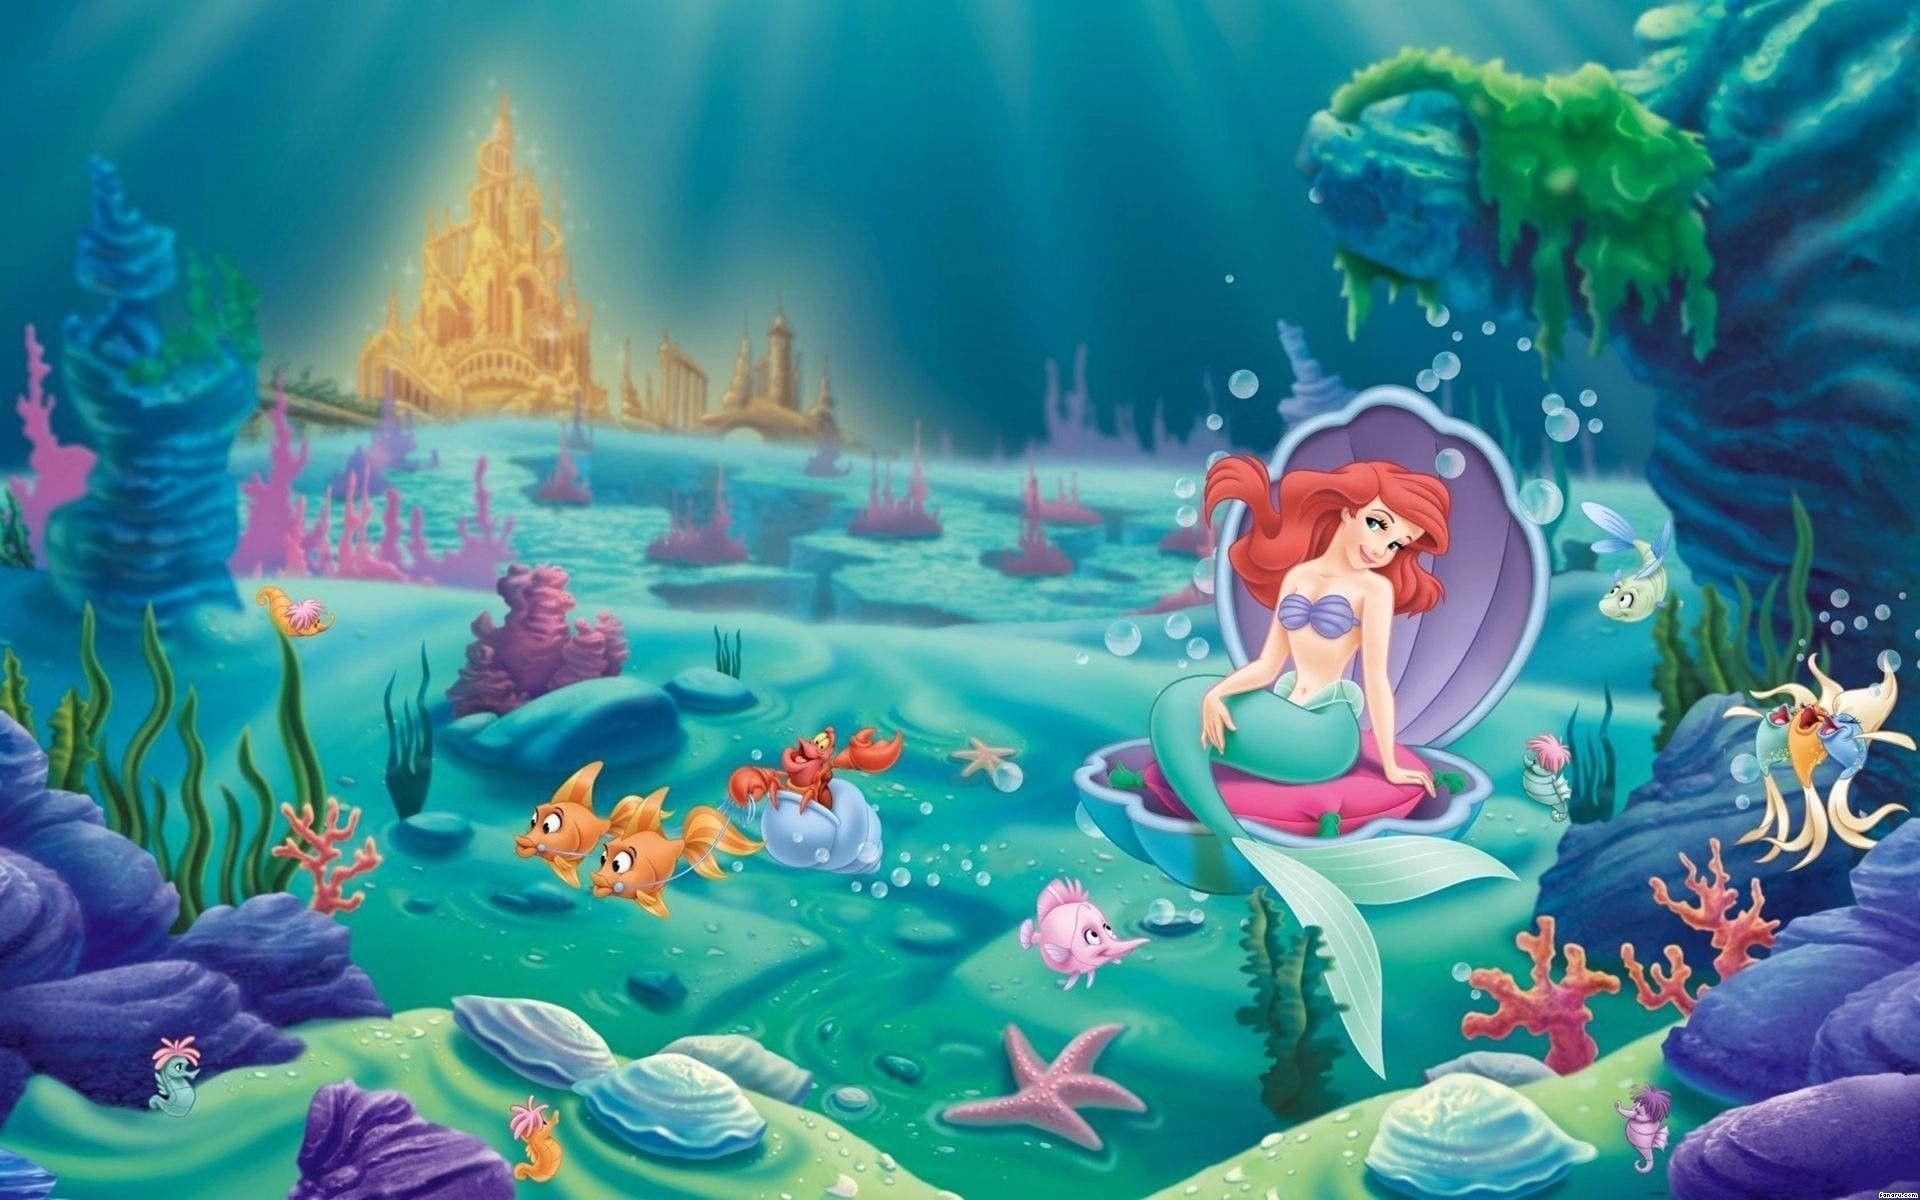 Little Mermaid Wallpapers Top Free Little Mermaid Backgrounds Wallpaperaccess